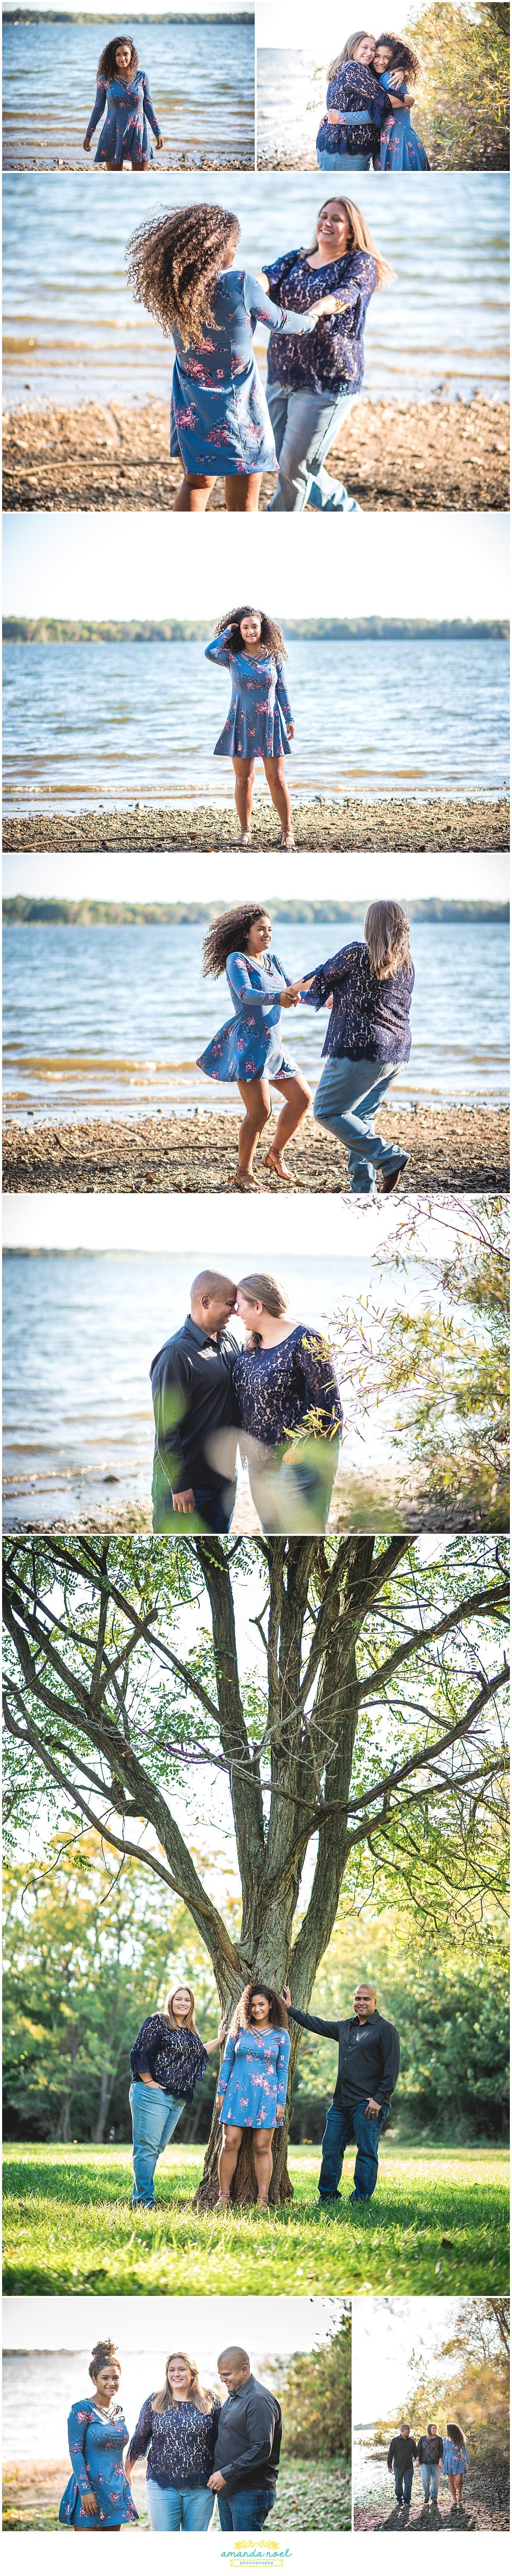 Dayton Ohio family photographer | Amanda Noel Photography | family beach portraits